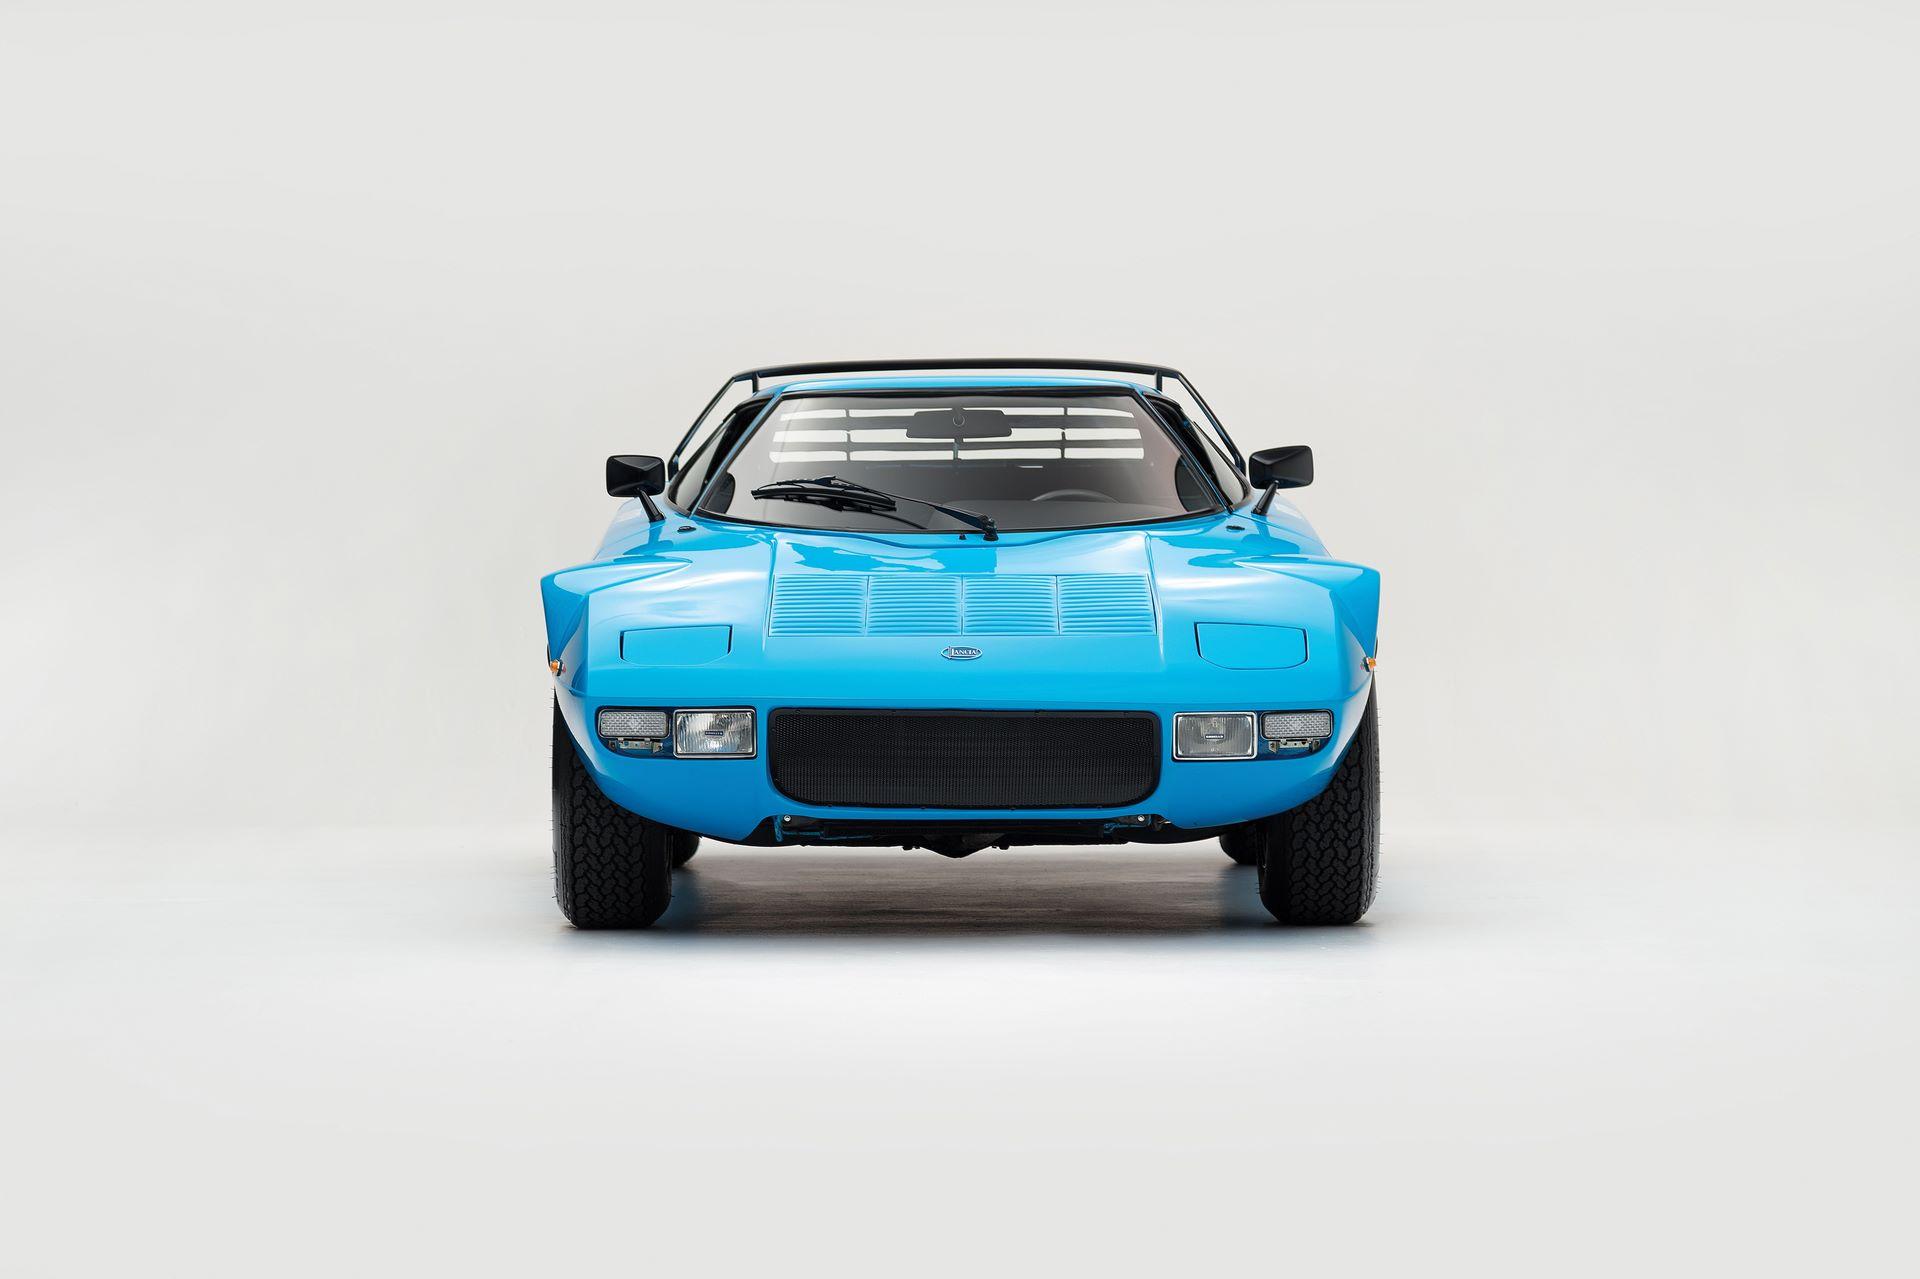 1975-Lancia-Stratos-HF-Stradale-by-Bertone_6